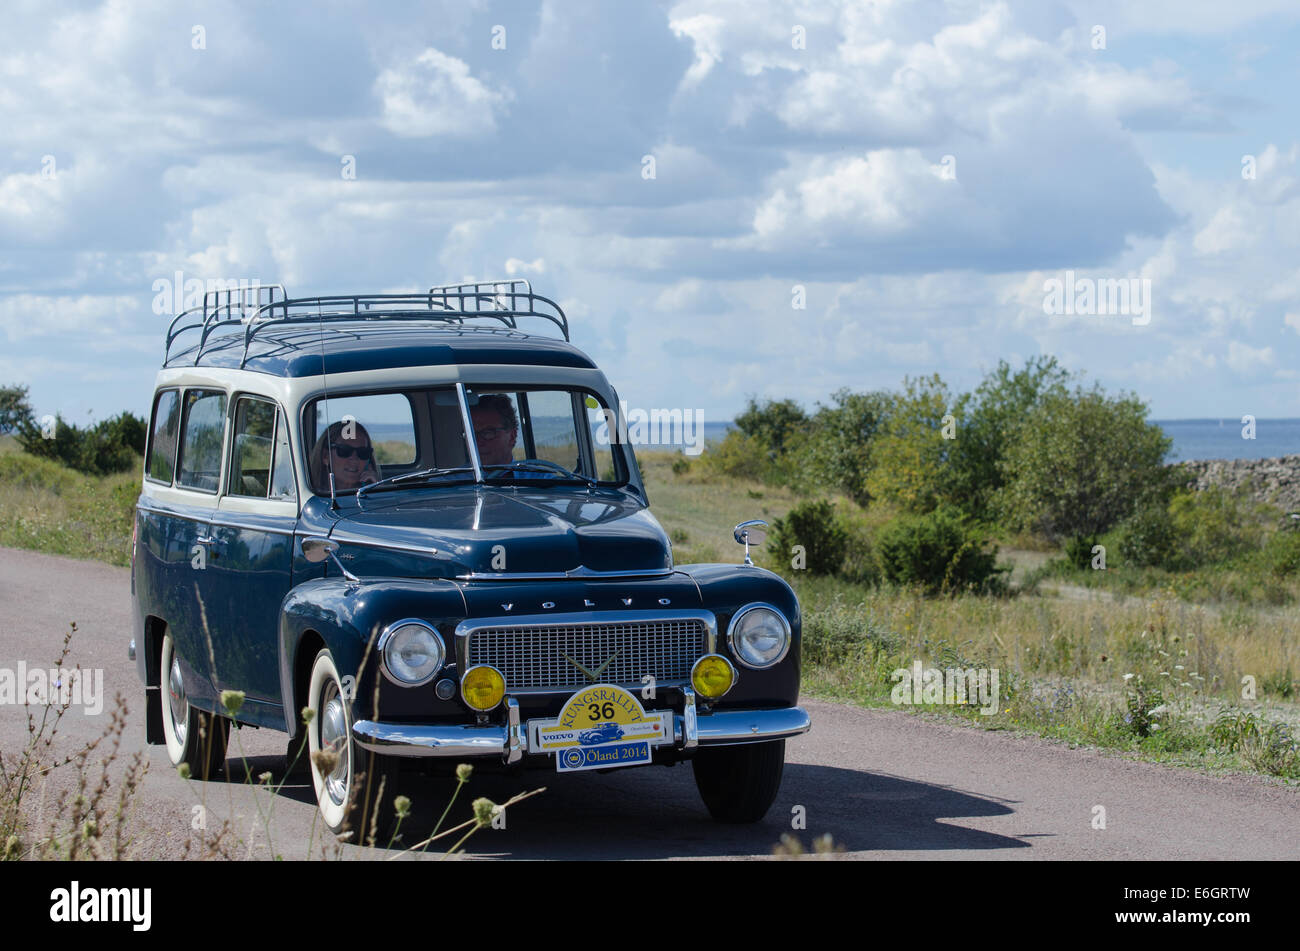 Octavia 440 Spartak 1957 classic oldtimer veteran old timer car